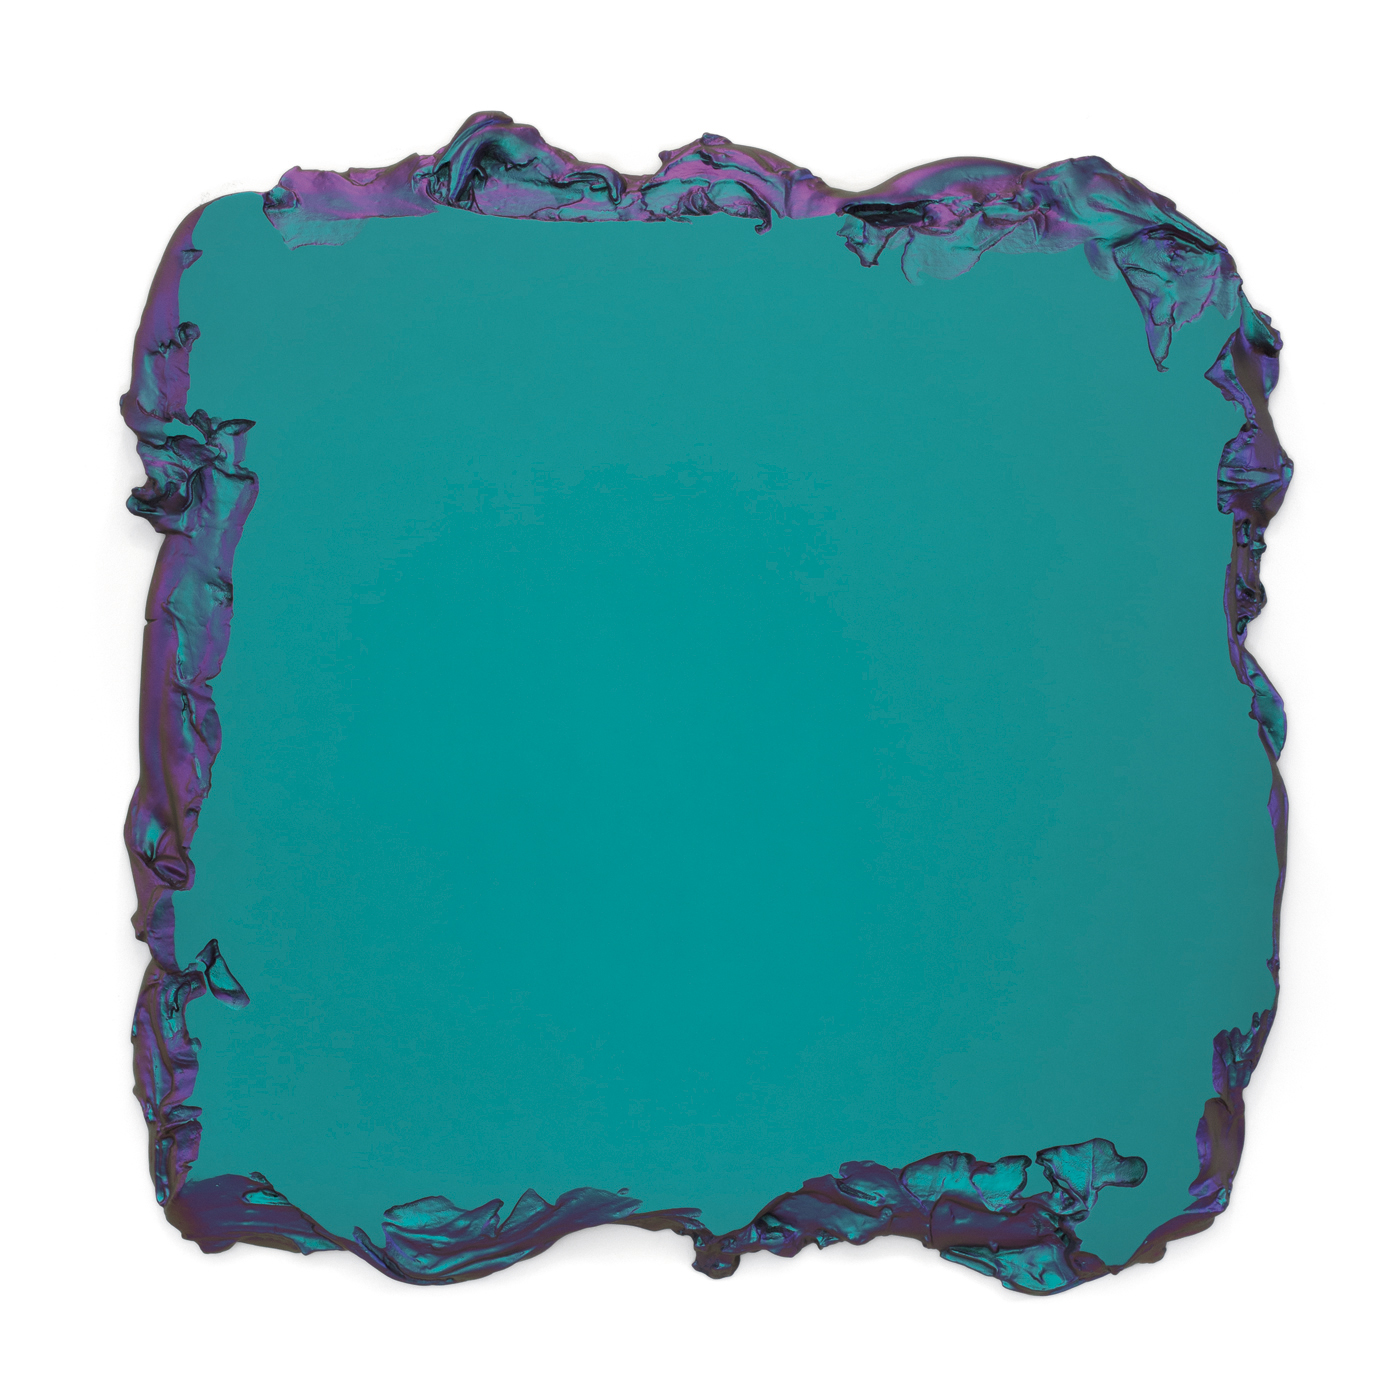 Juri Markkula Green to Lilac 150x150cm Interference pigment, polyurethan